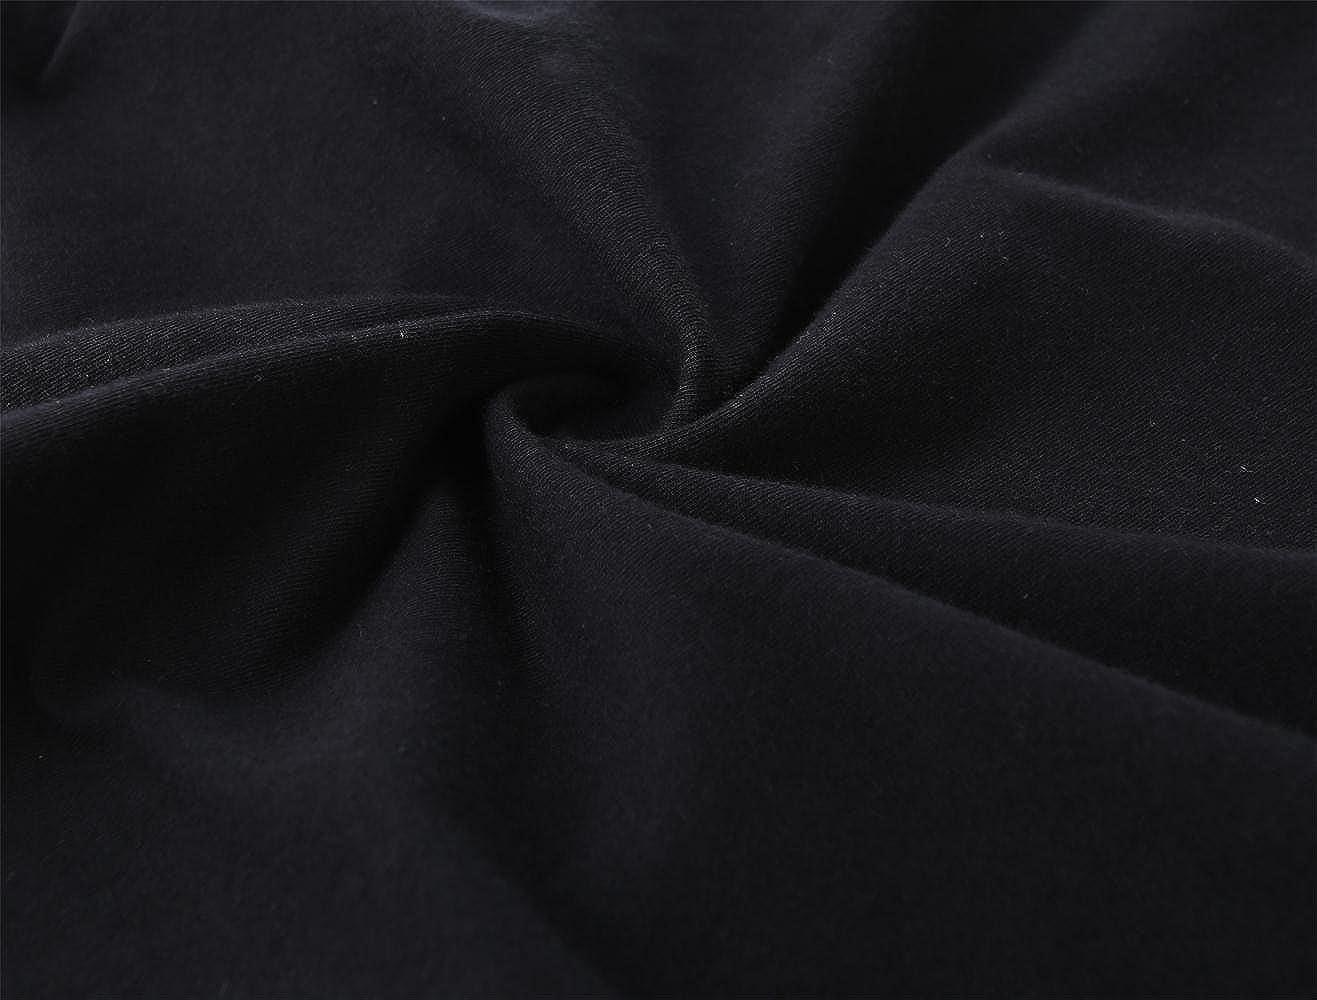 Manci Nursing Top Tank Cami Womens Cotton Maternity Pajama Tops Sleep Bra for Breastfeeding